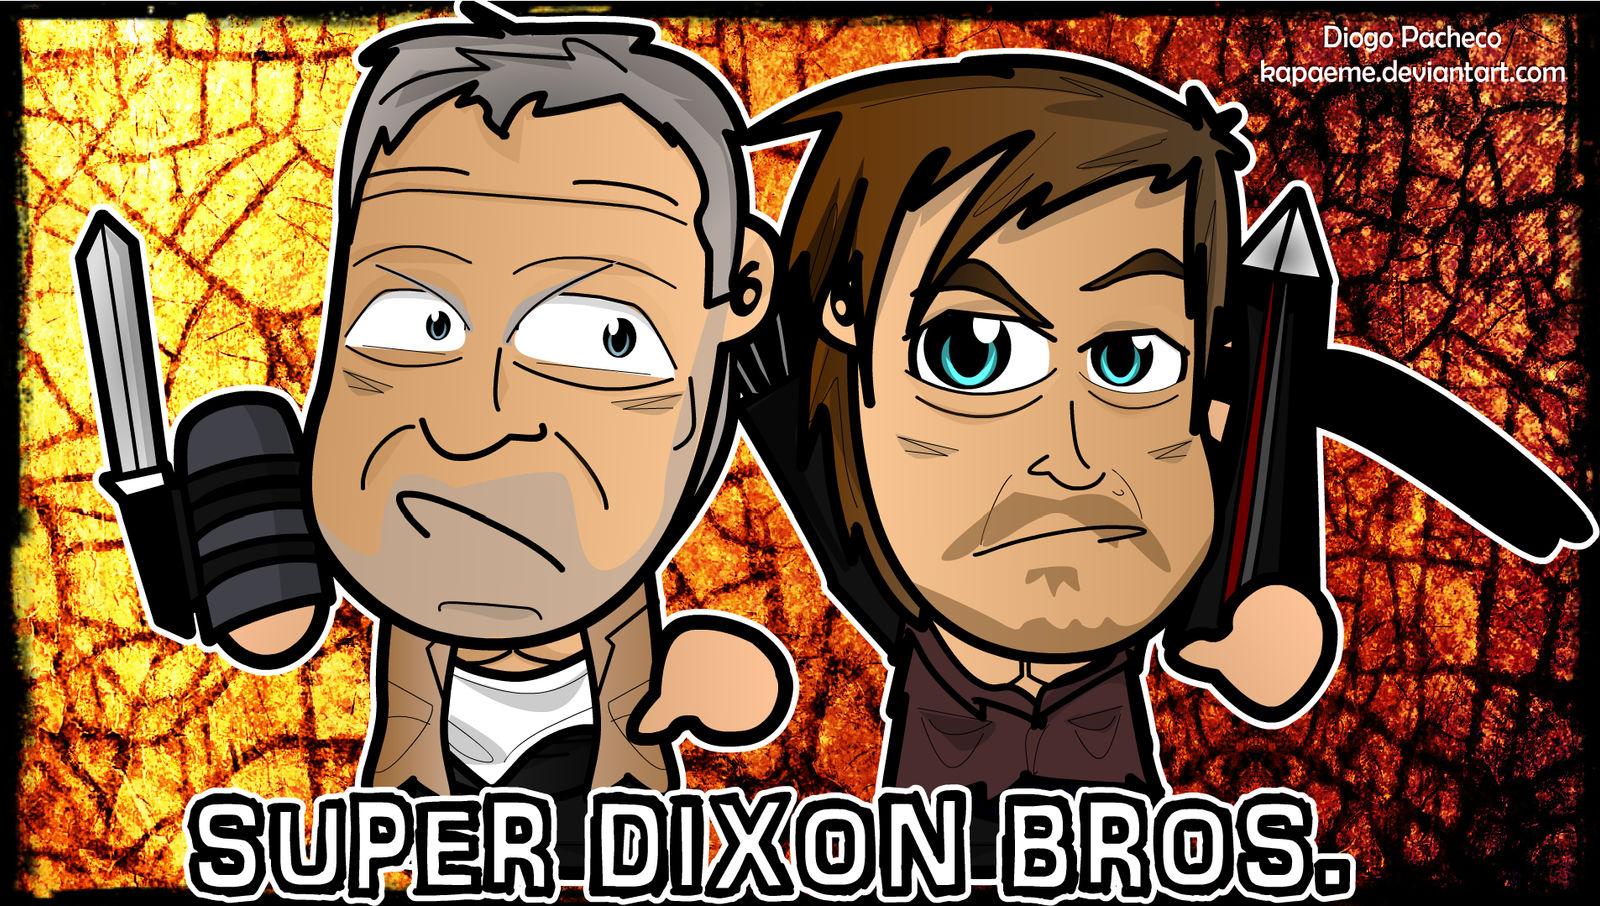 Super Dixon Bros The Walking Dead Wallpaper By Kapaeme On Deviantart